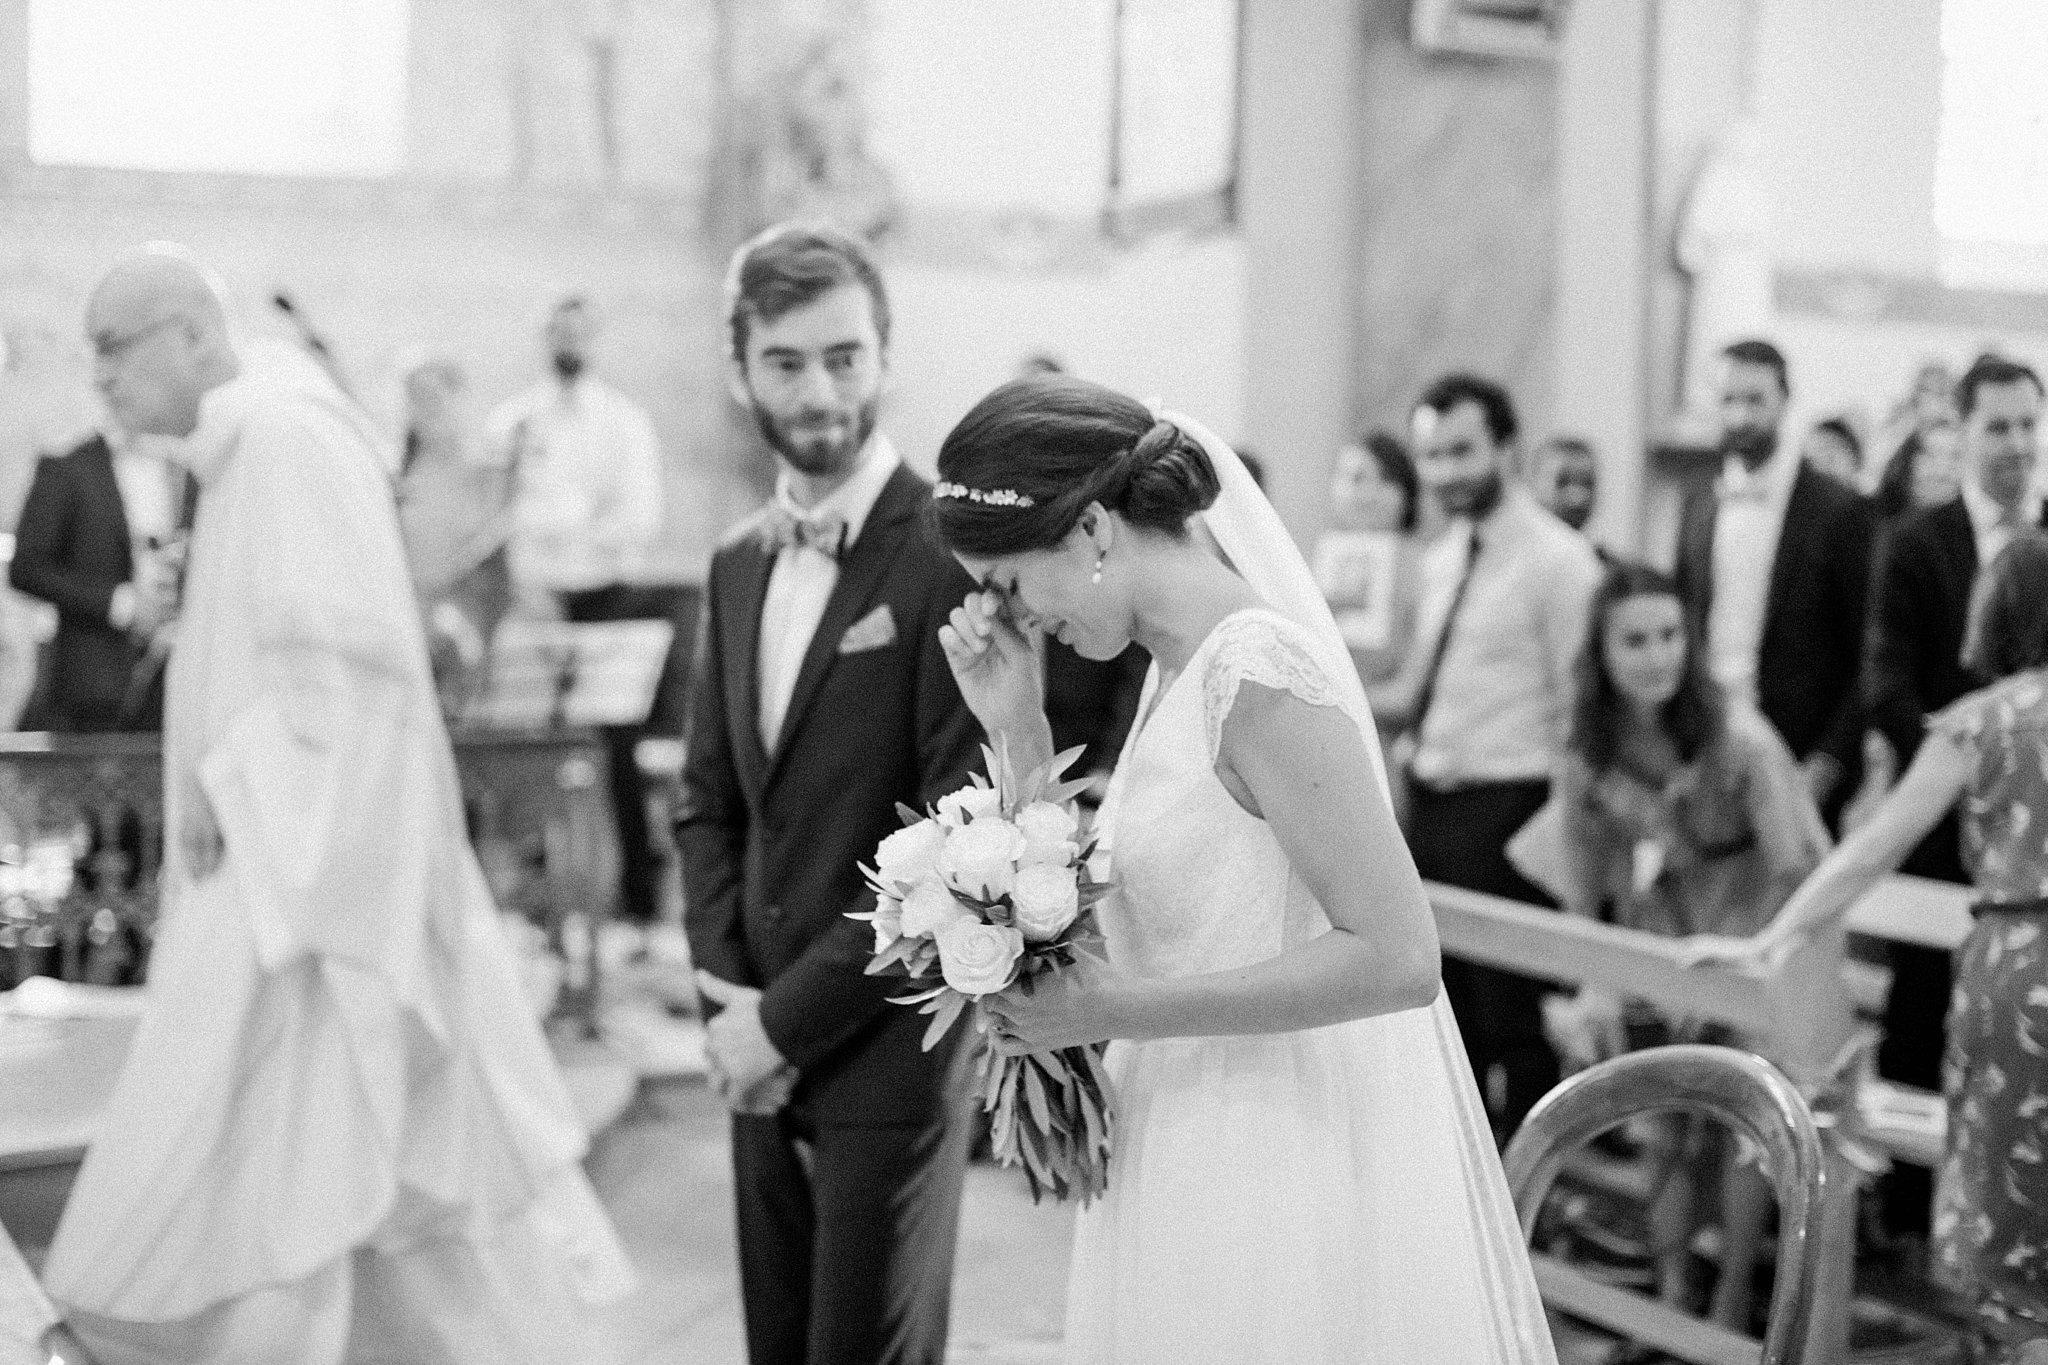 Mariage-a-la-maison-secall-hugo-hennequin-photographe-mariage-perpignan_0083.jpg